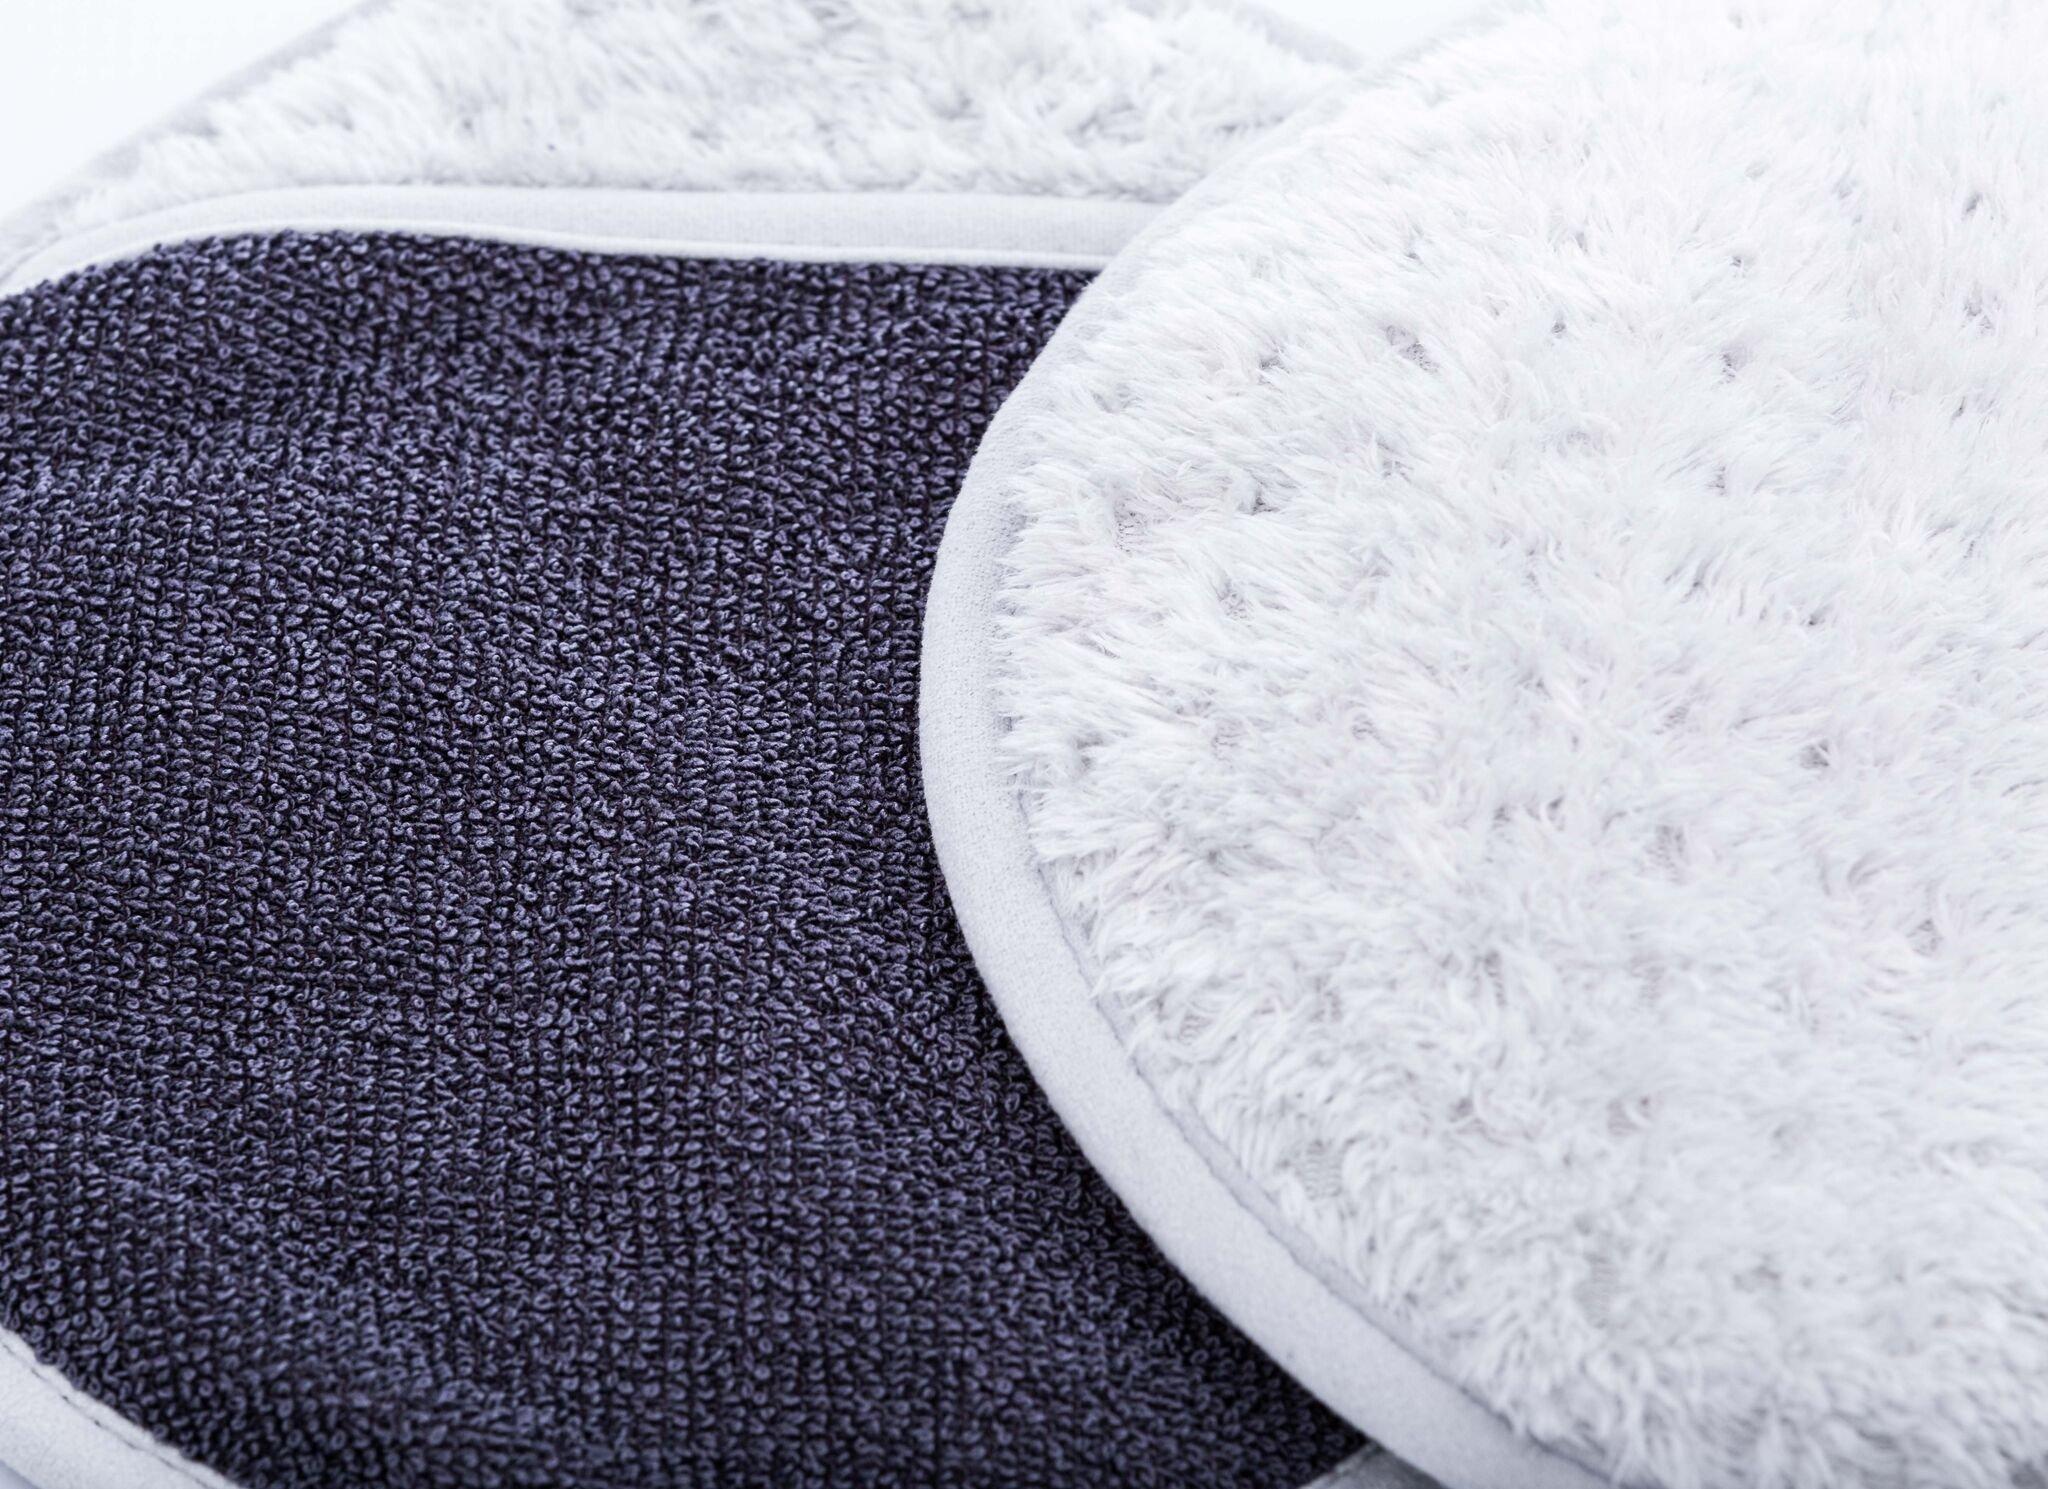 THE RAG COMPANY 25 in. x 36 in. Twist N' Shout Professional Korean 70/30 550gsm Twist Loop Microfiber Drying Towel & Smitten Dry Mitt Combo